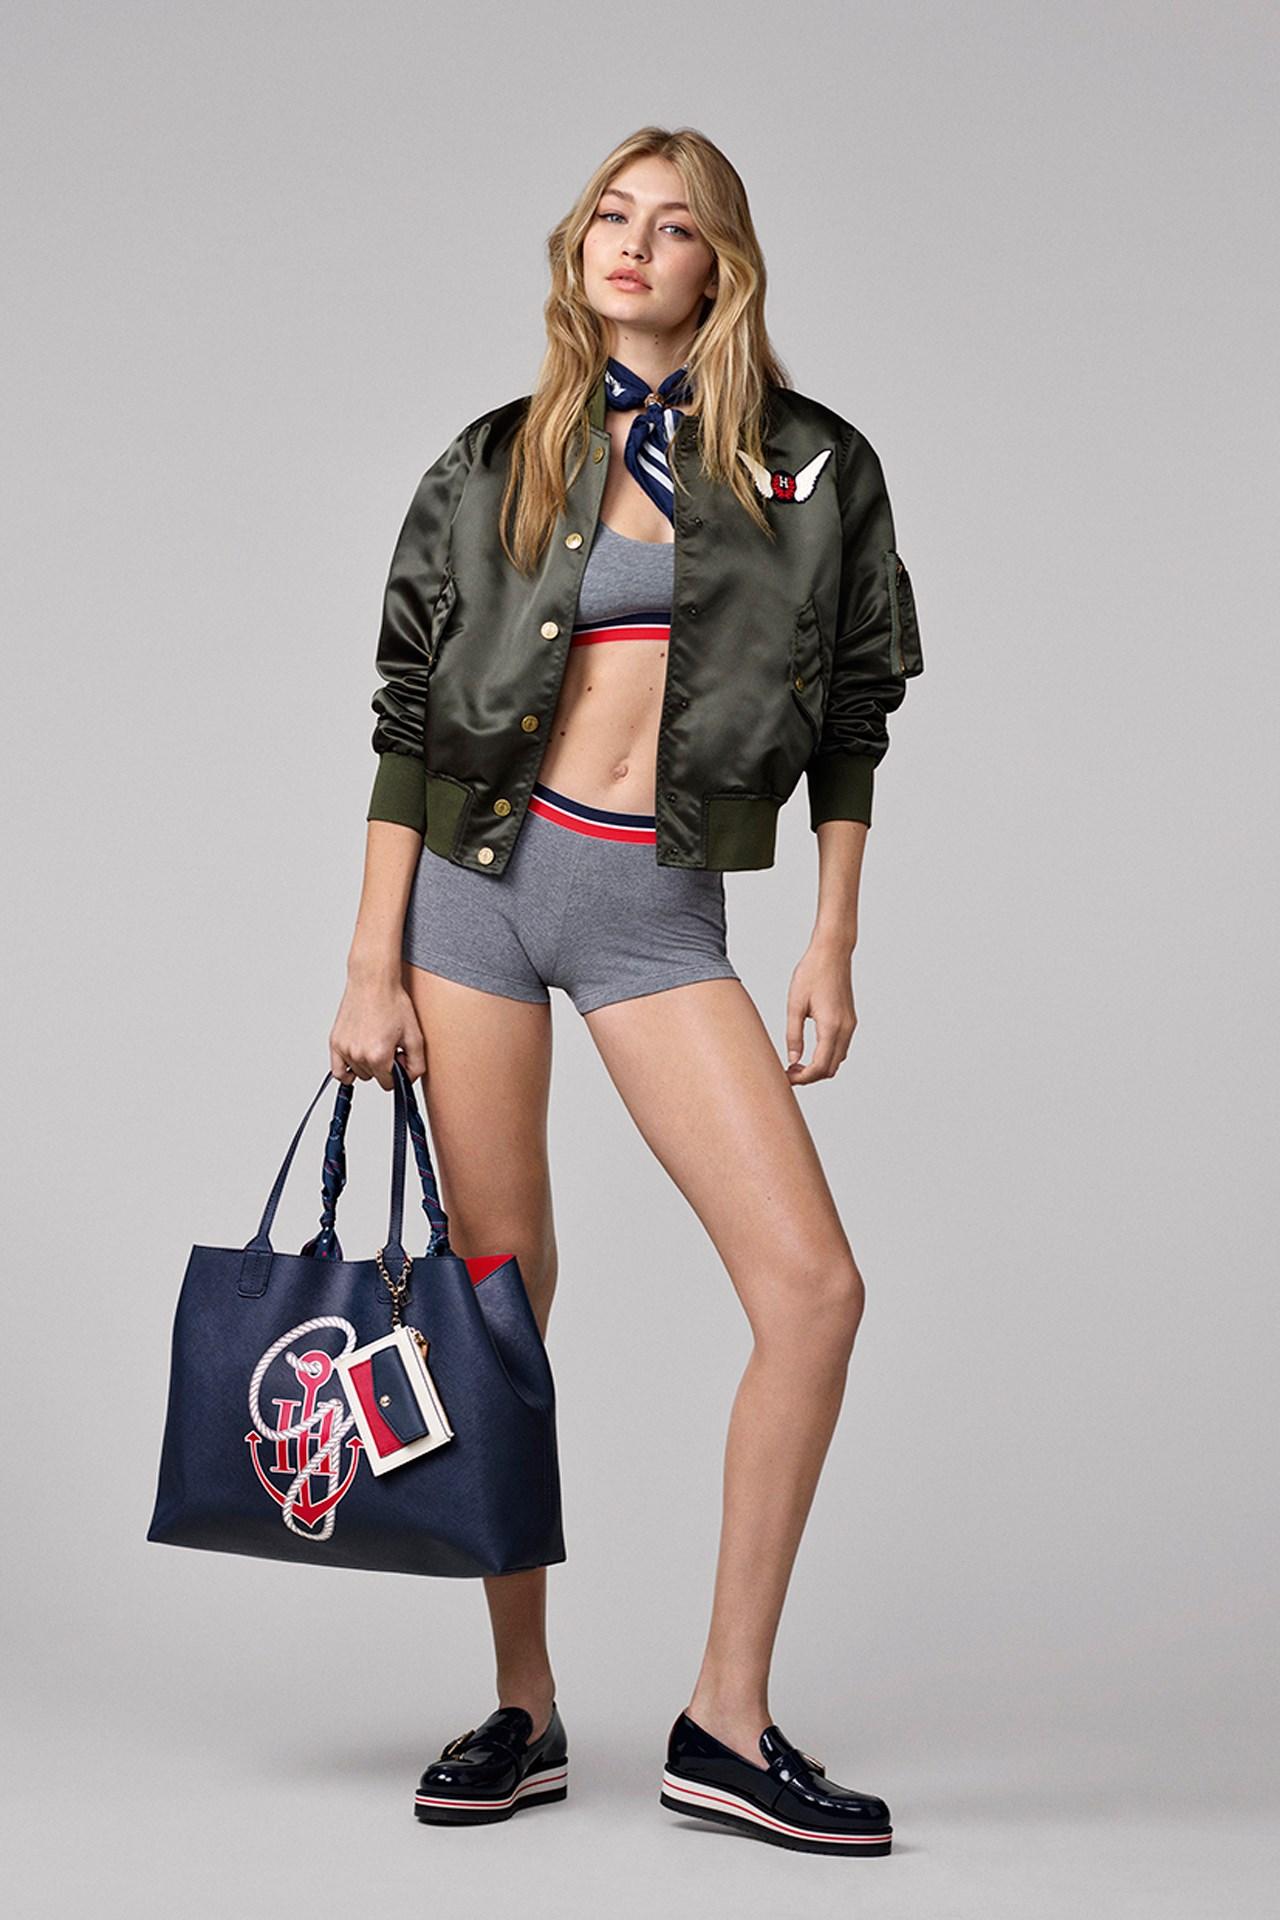 Gigi Hadid Slays Look for Tommy Hilfiger Campaign